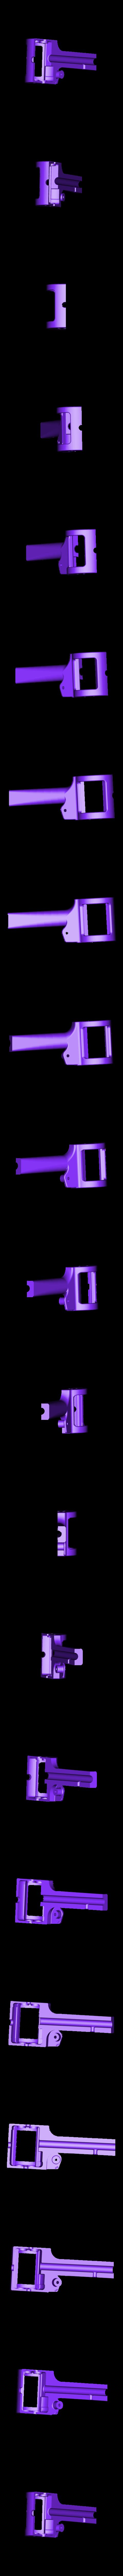 arm rear2 (1pcs).STL Download STL file Folding Quadcopter 450 Frame • 3D print object, AleksandrDolzhenko